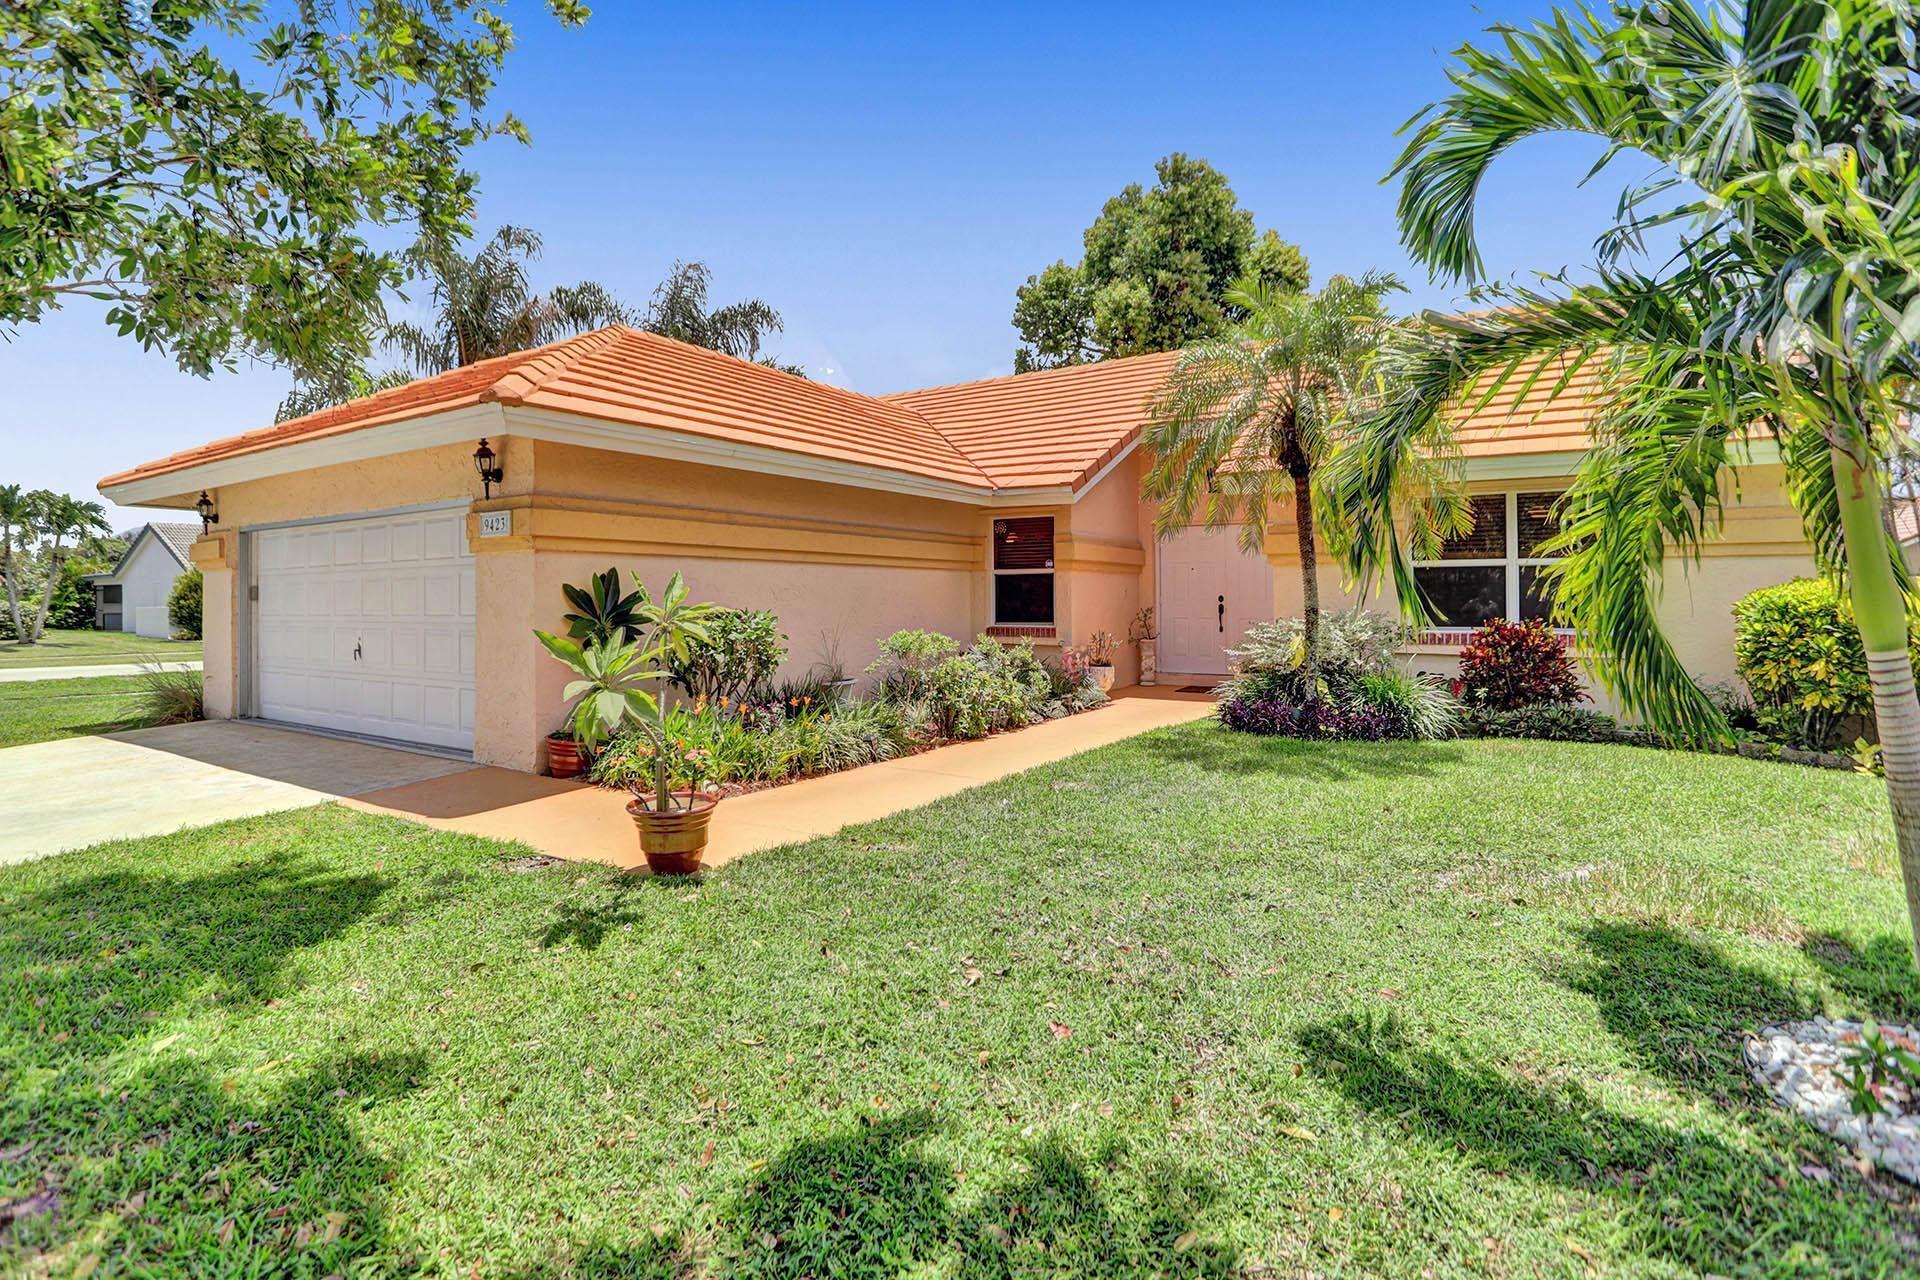 9423 Nursery Lane, Boynton Beach, FL 33437 - MLS#: RX-10732745